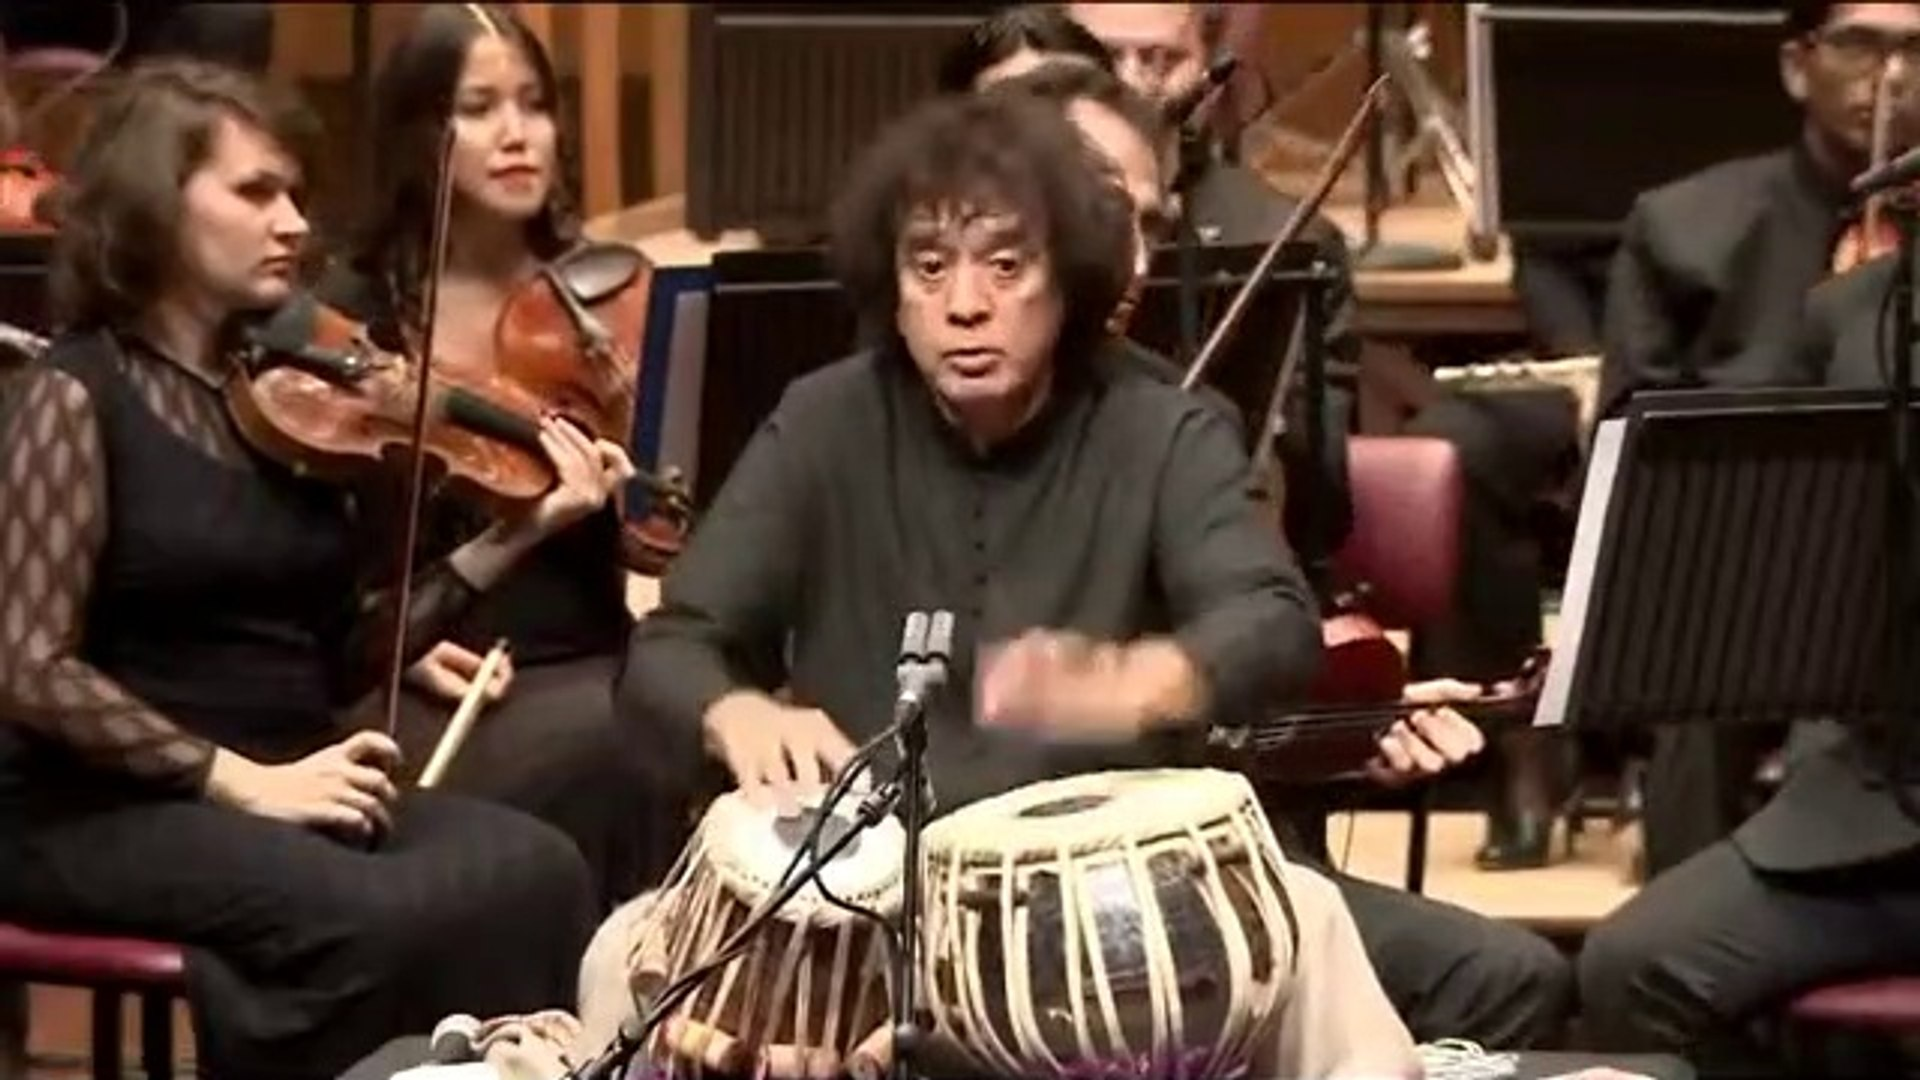 Zakir Hussain Peshkar concerto for tabla and orchestra Symphony Orchestra of India